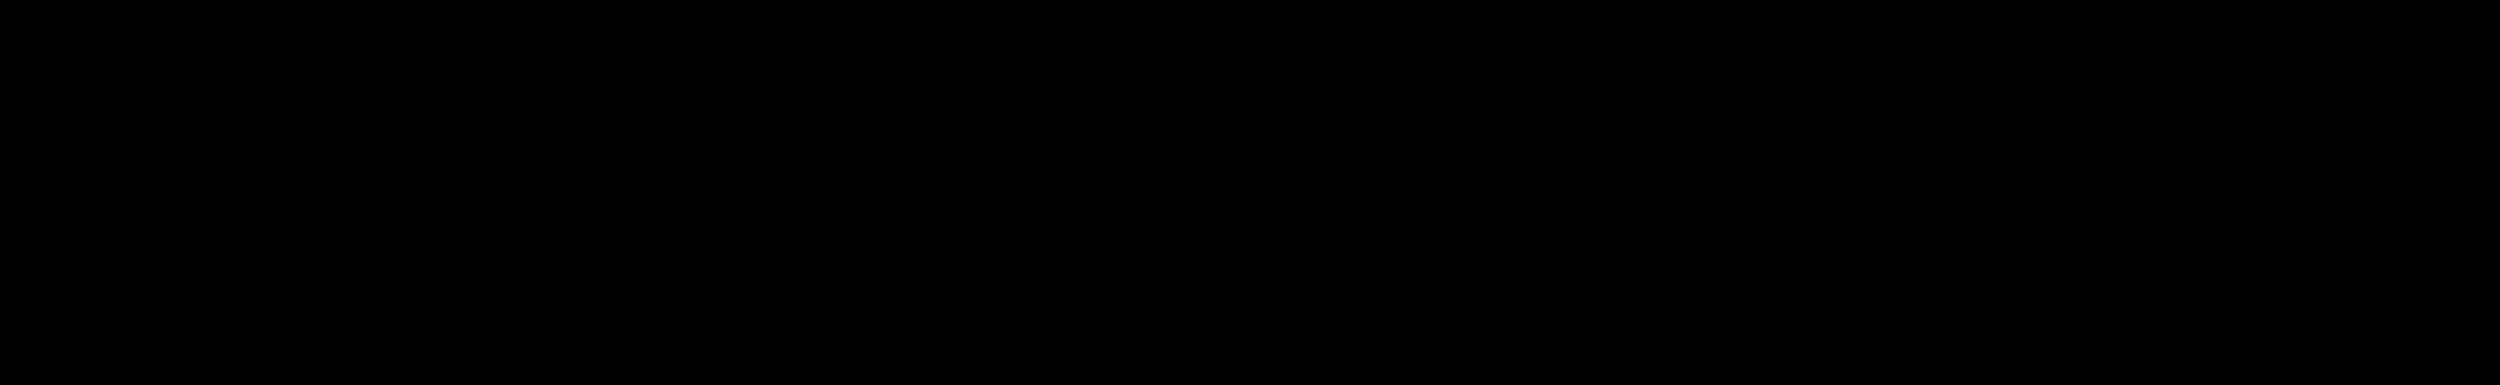 burk-uzzle-subs-3.png